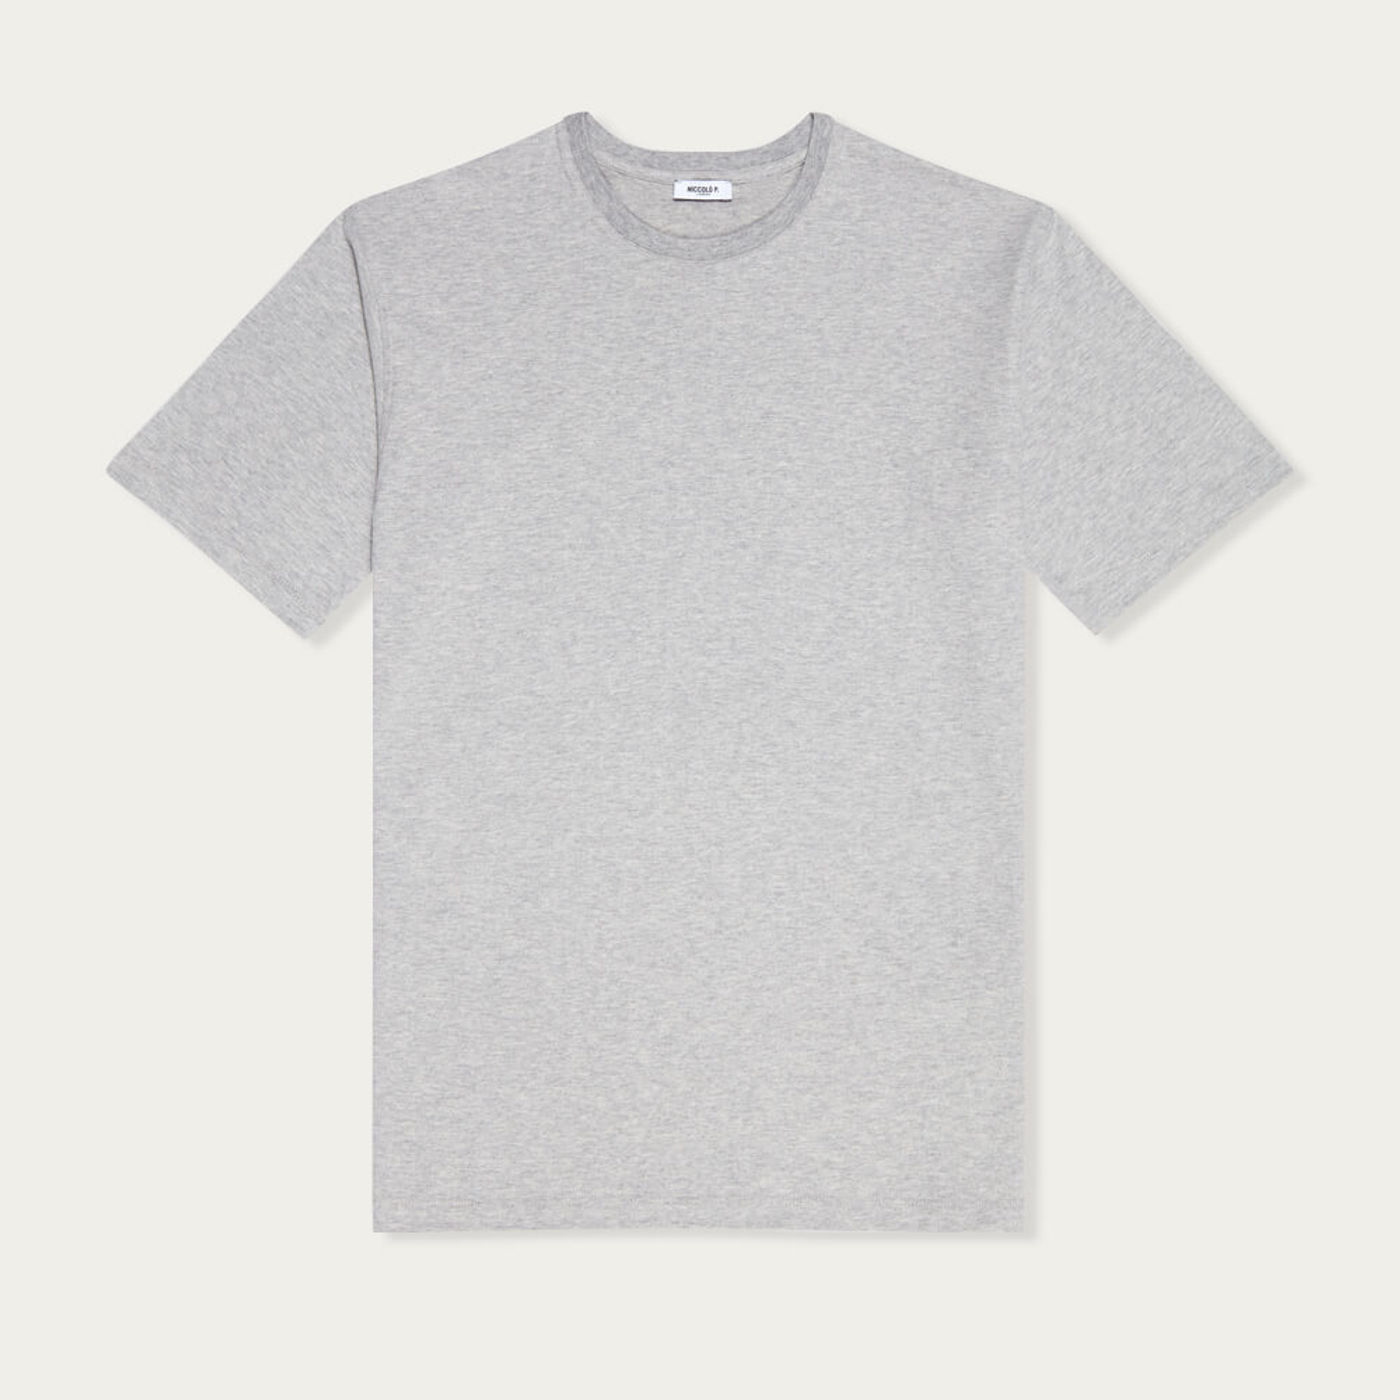 Grey Mélange Crew Neck T-Shirt, Supima Cotton   Bombinate